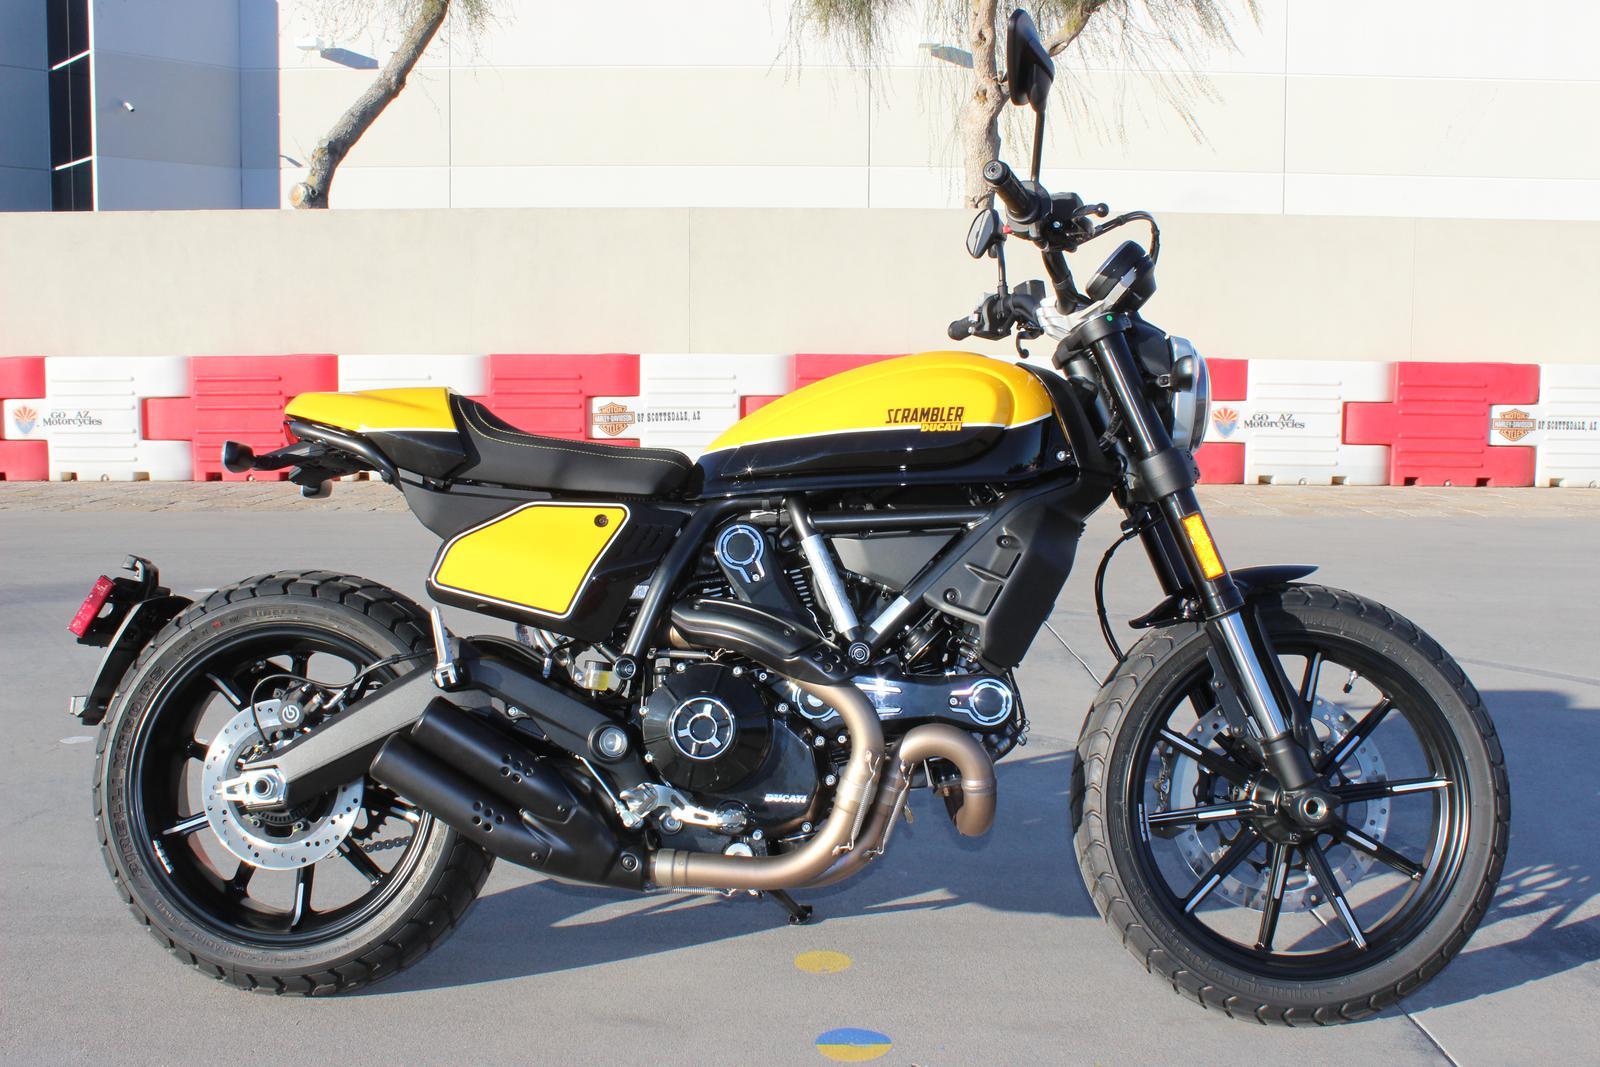 2019 Ducati Scrambler Full Throttle For Sale In Scottsdale Az Go